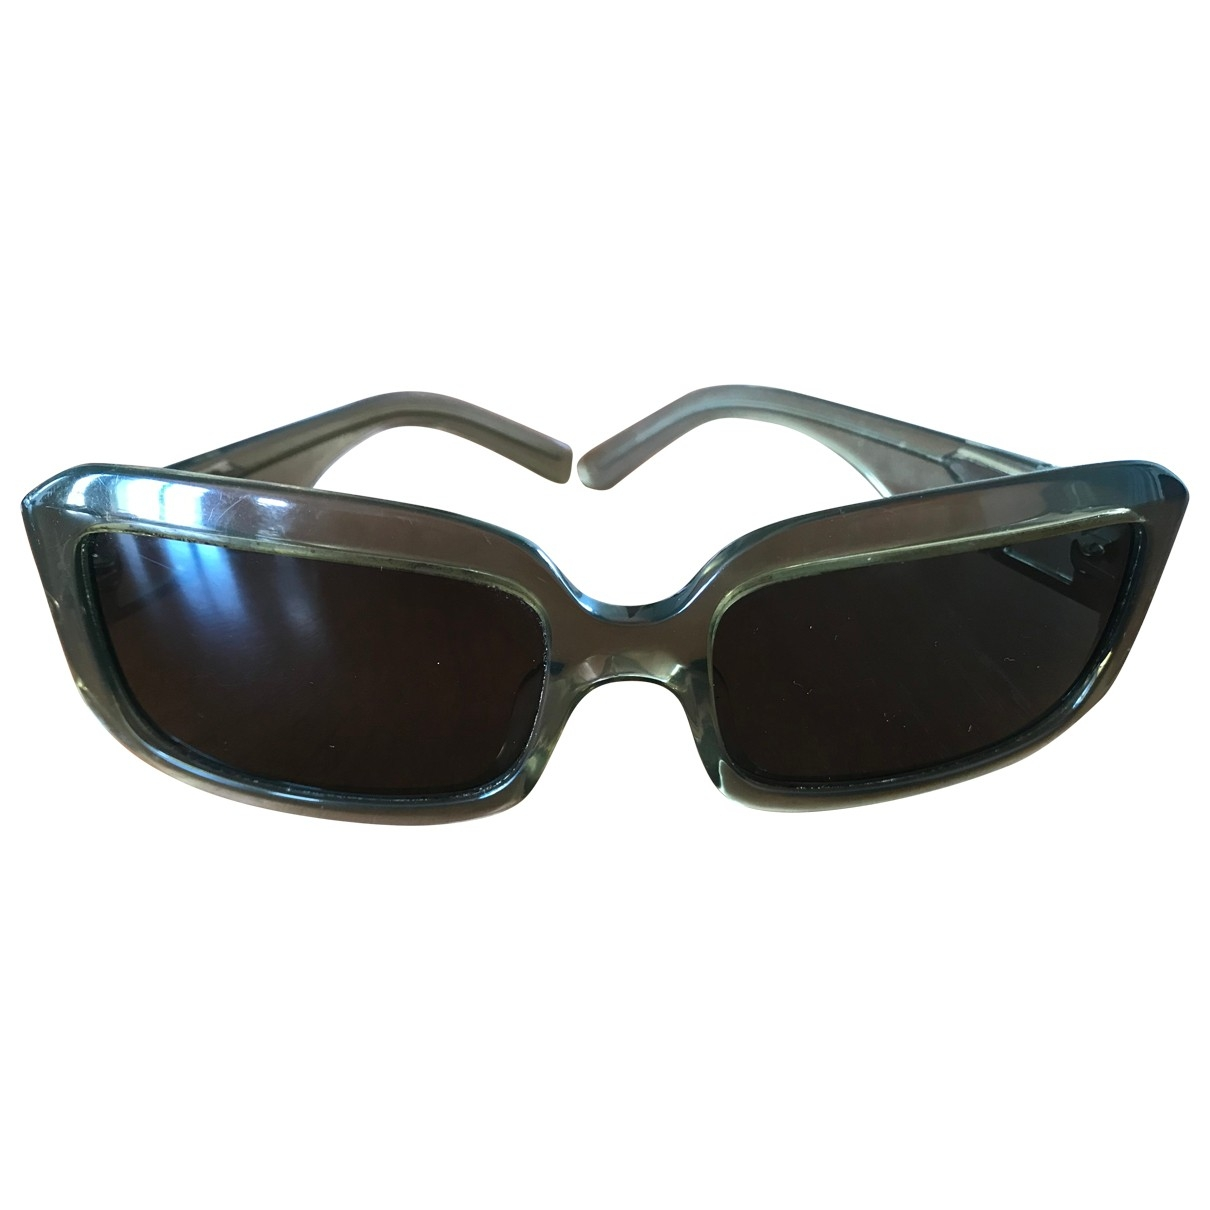 Miu Miu \N Khaki Sunglasses for Women \N